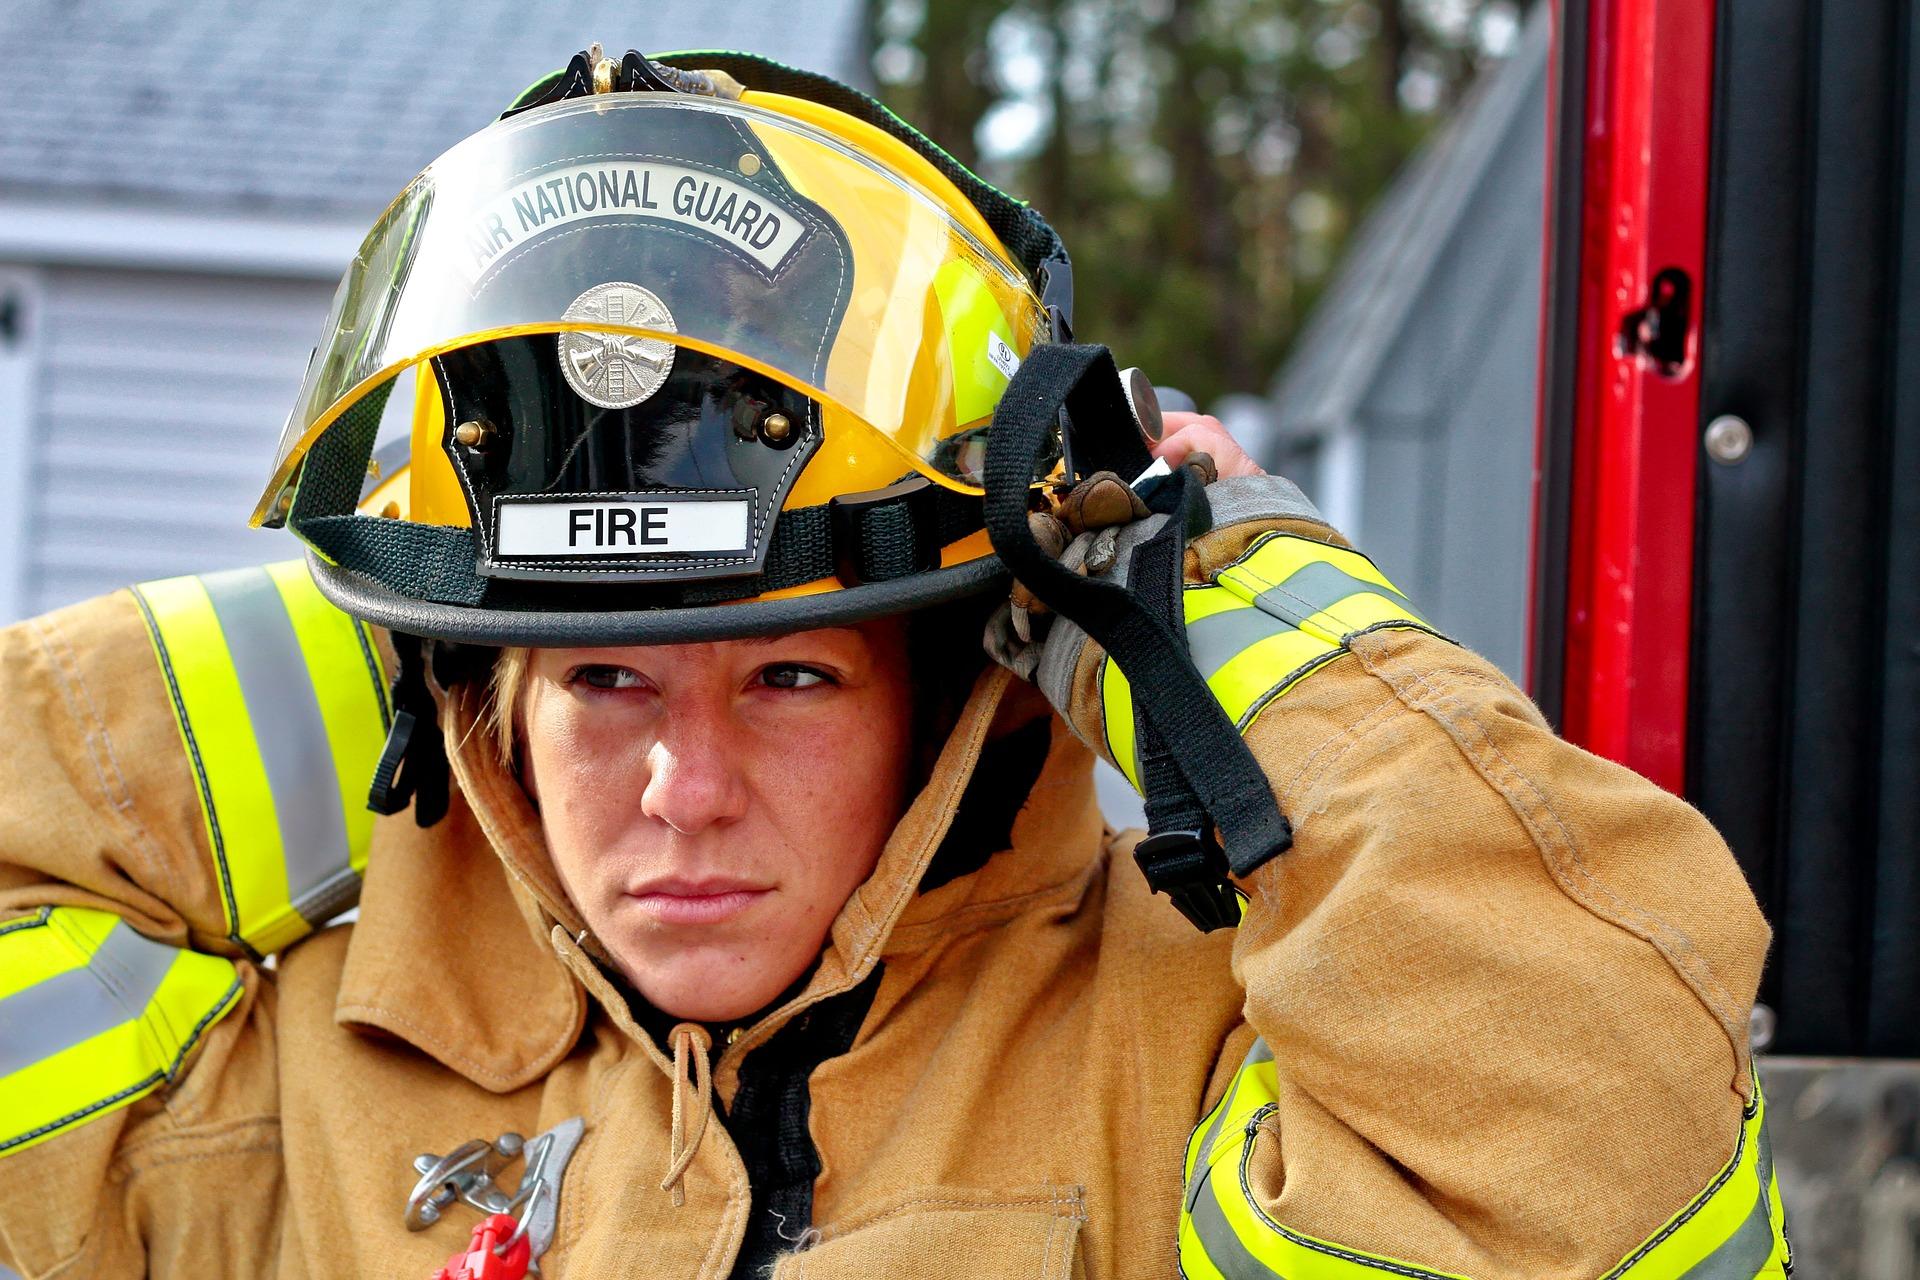 woman-fire-fighter-958266_1920.jpg